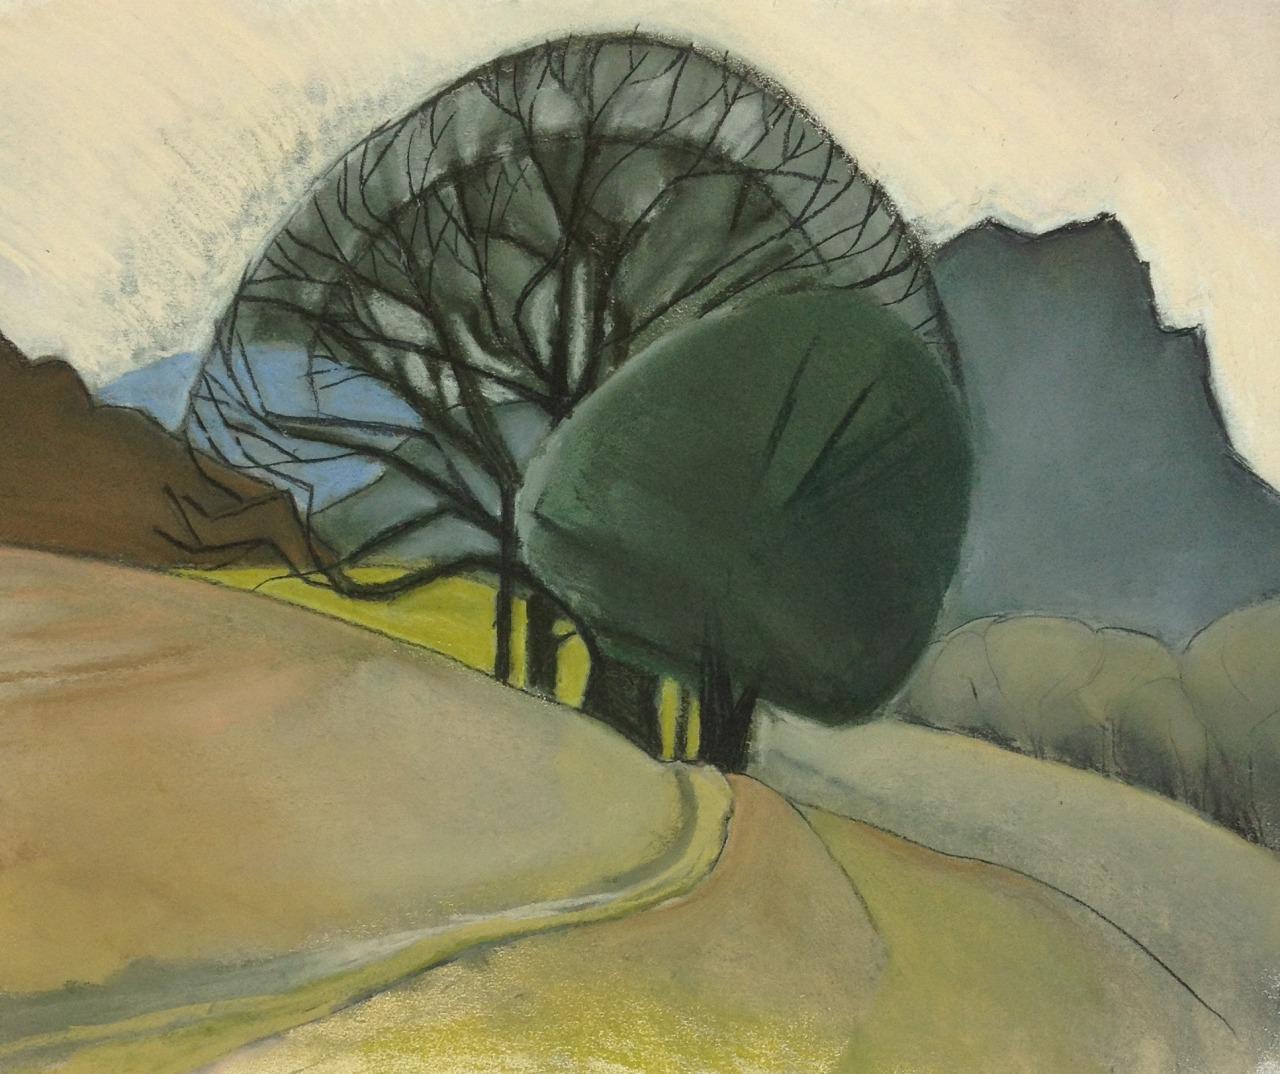 torfalcon:  Three Trees, April 2015 pastel on paper 33x30cmsTor Falcon